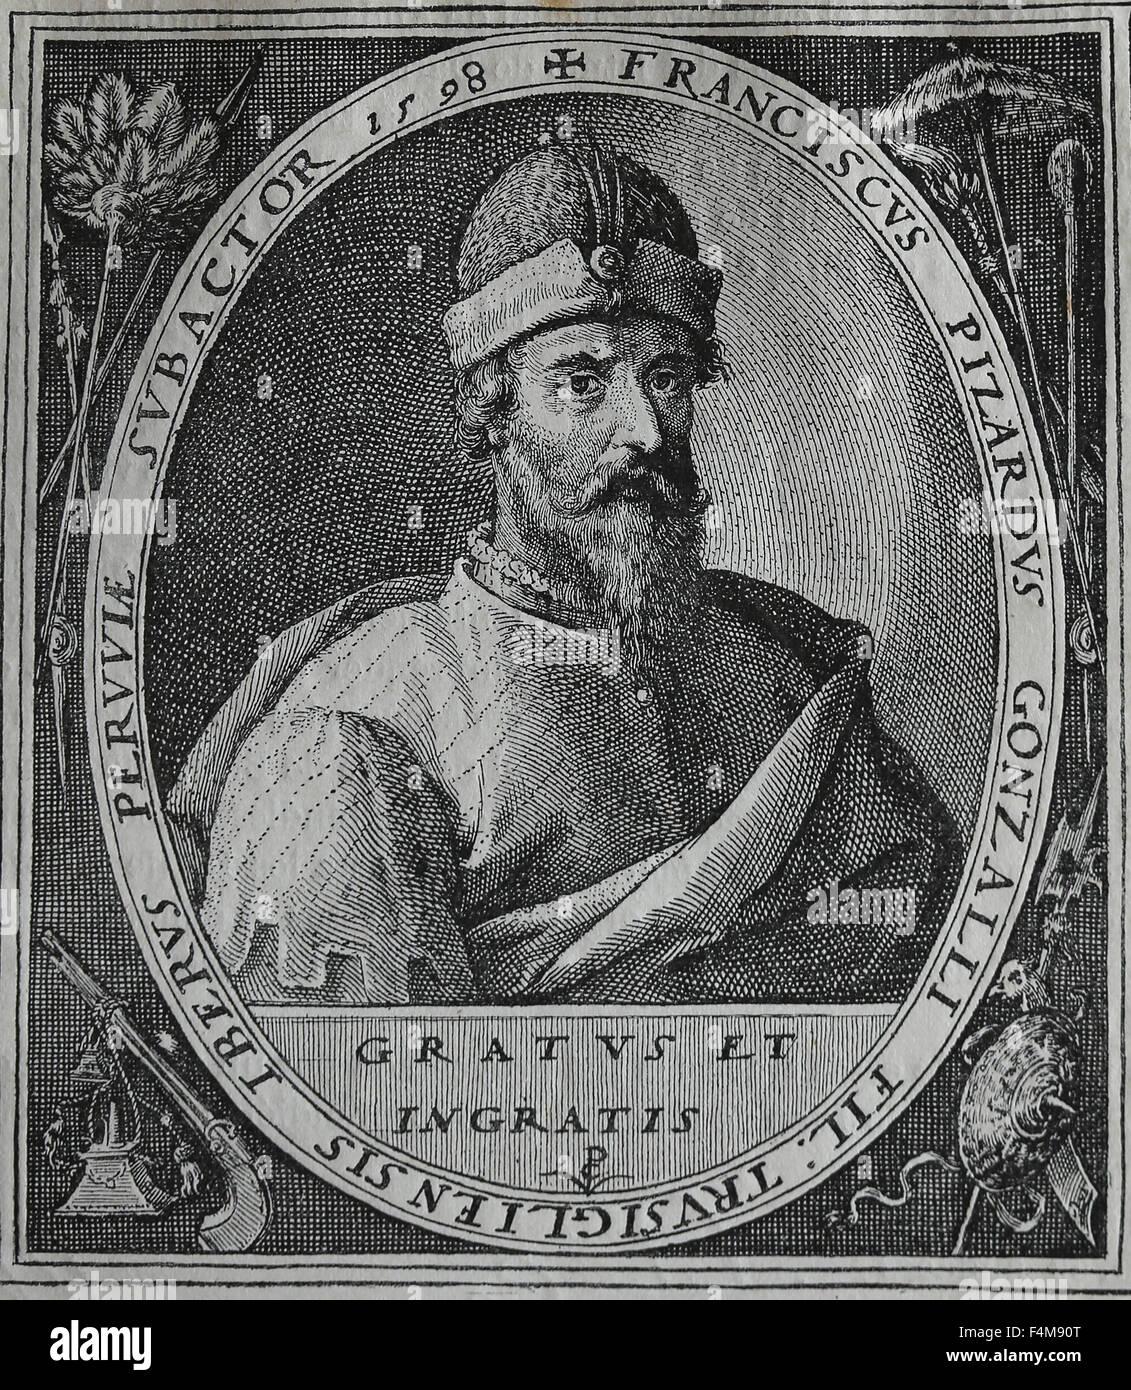 Francisco Pizarro (1471-1541). The Spanish conqueror of the Inca Empire. Portrait. Engraving, 16th century. - Stock Image